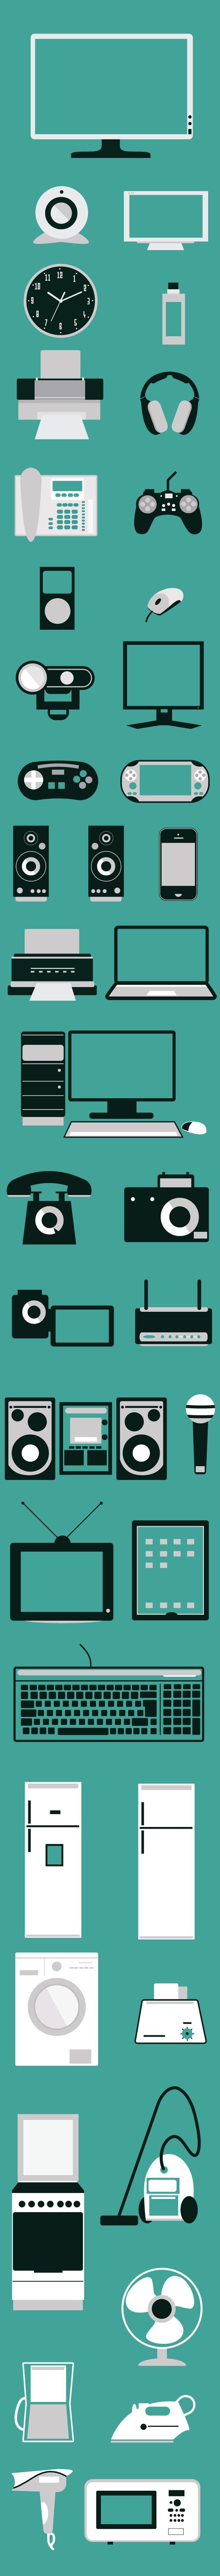 designtnt-electronic-devices-flat-vector-elements-large